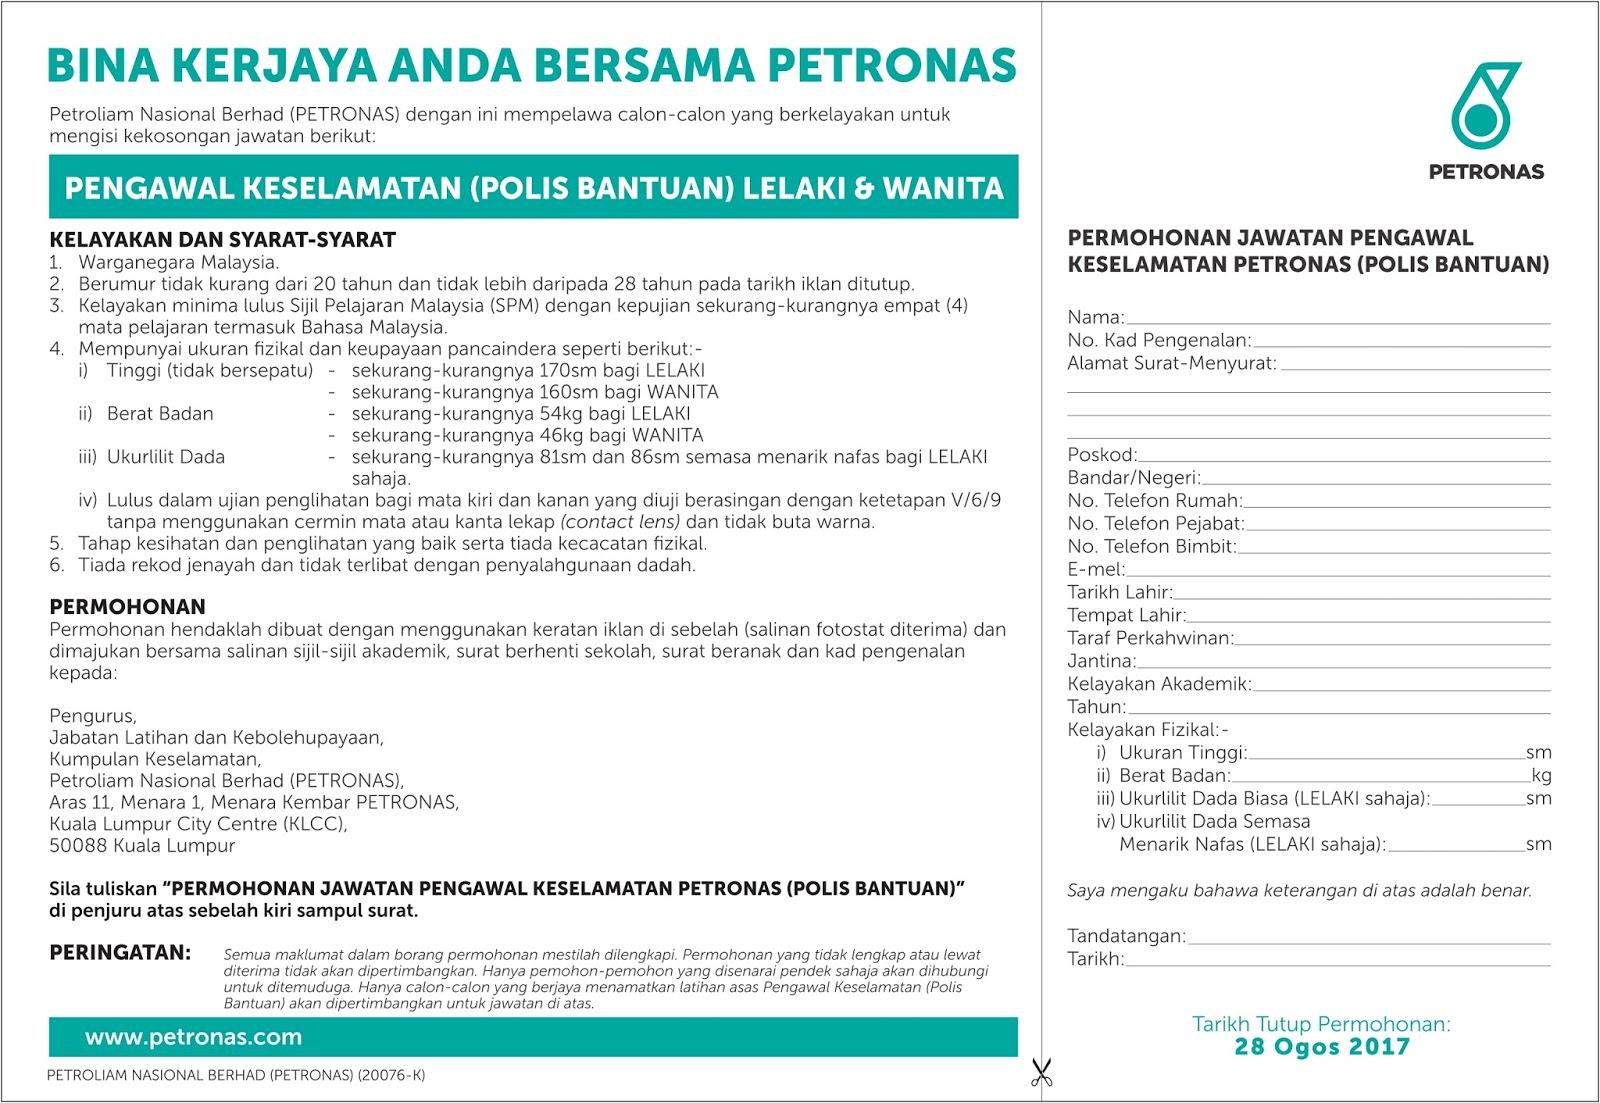 Jawatan Kosong Polis Bantuan Petronas 2018 Jawat Koso